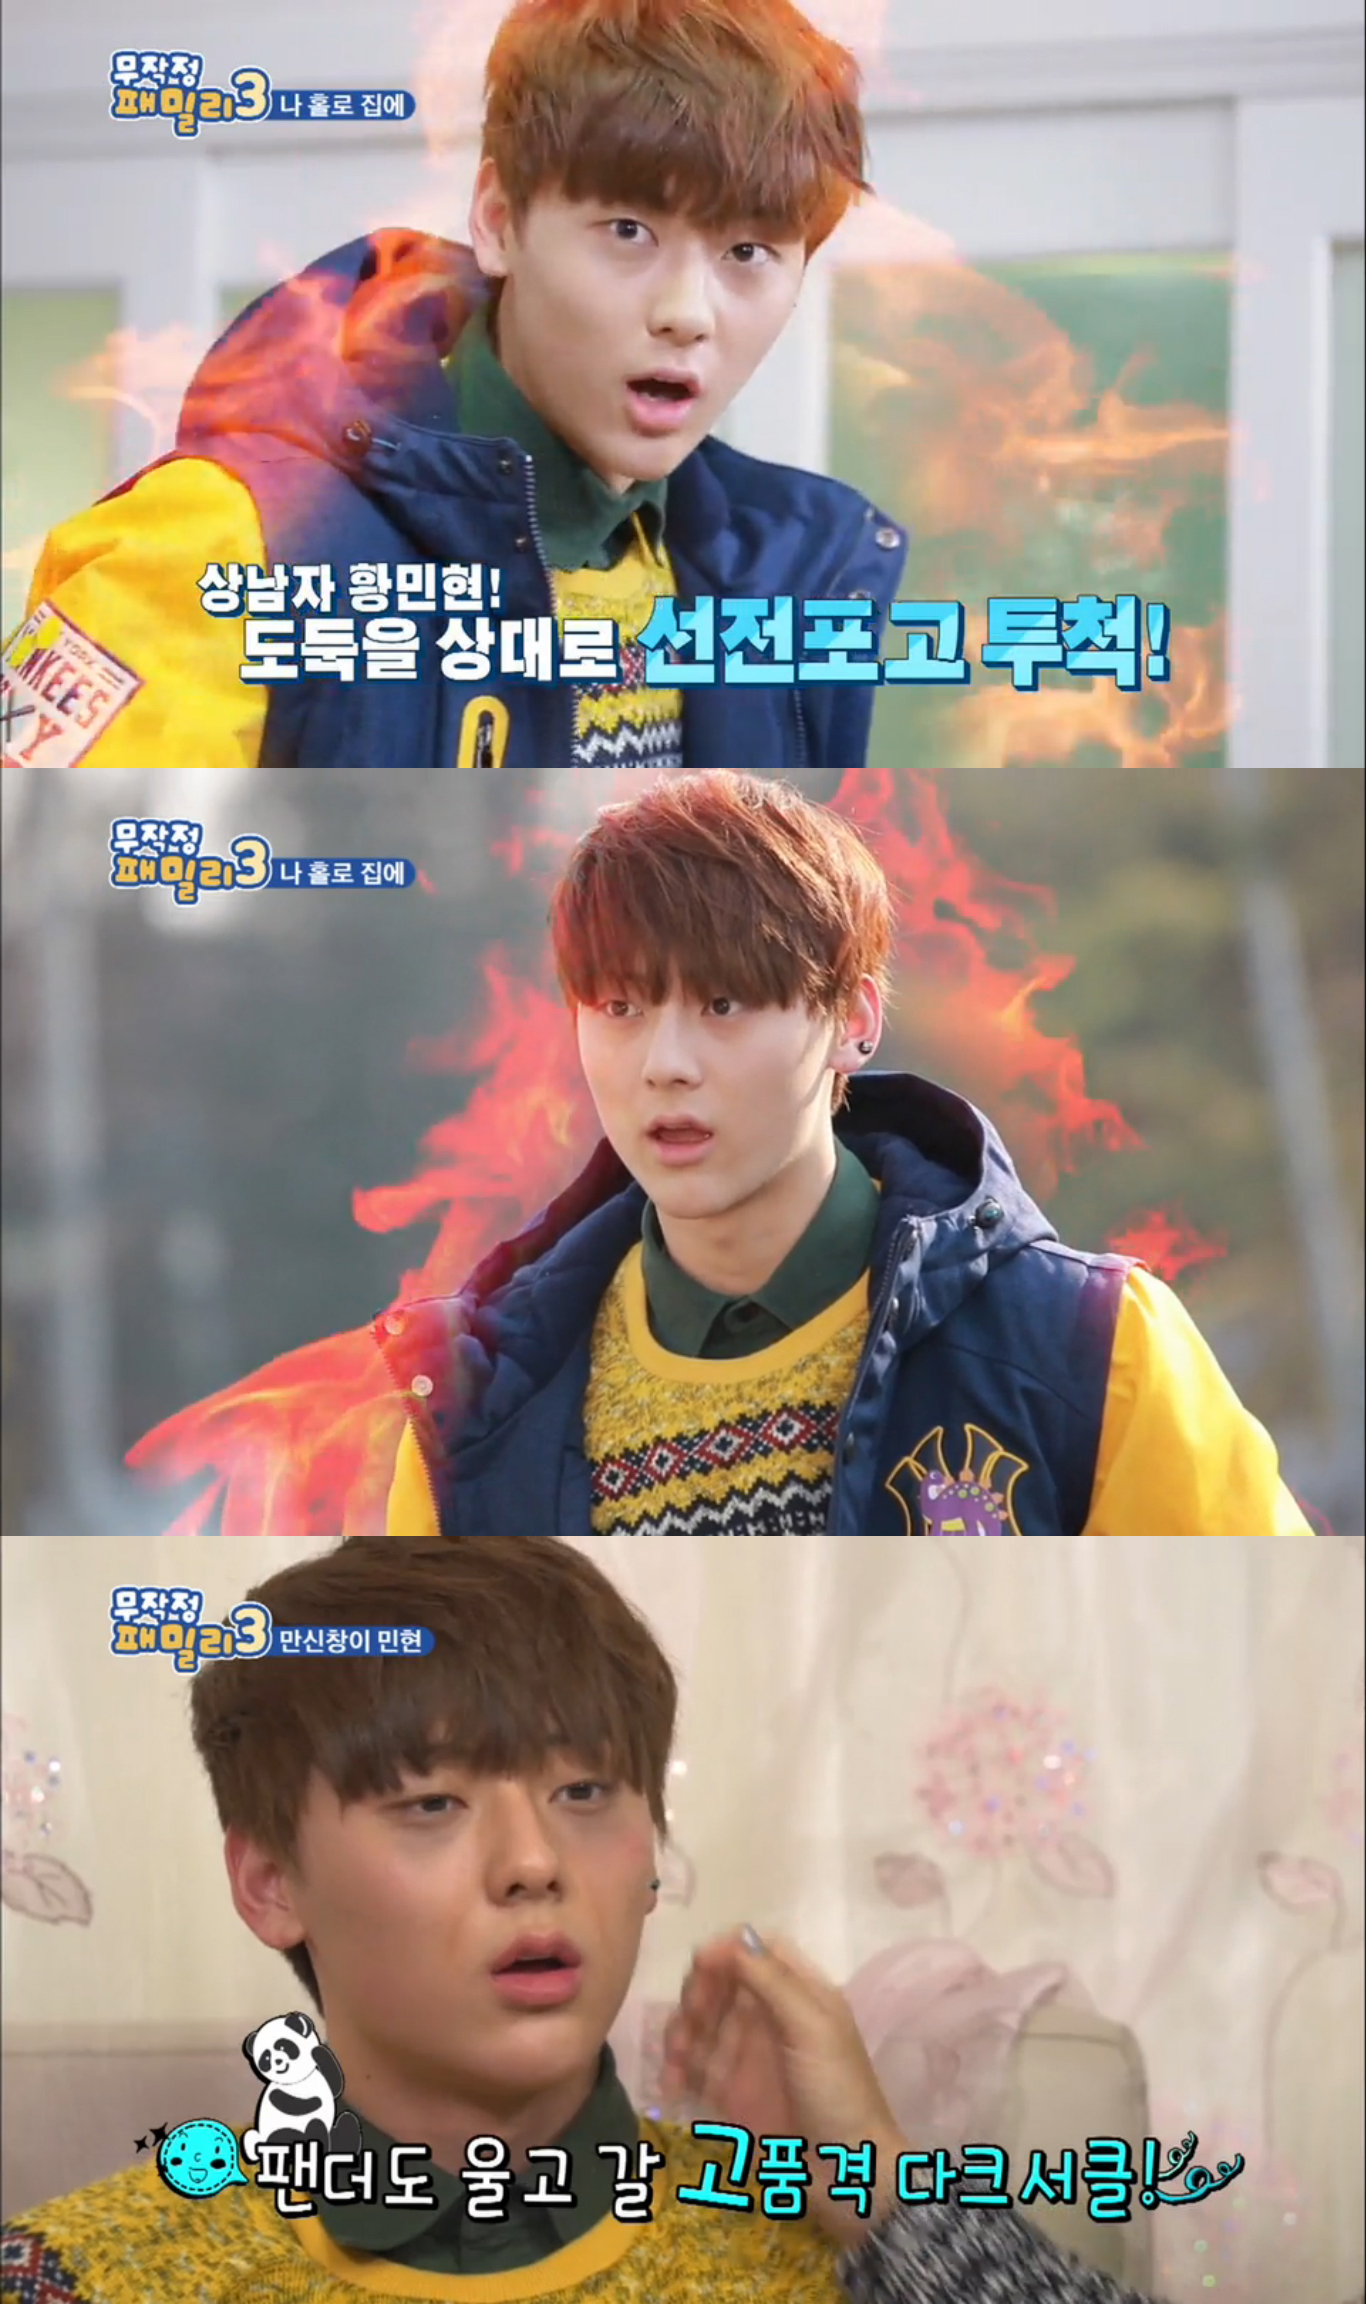 NU'ESTのミンヒョン、 韓国バラエティ番組「無計画ファミリー」Season3に出演 方言を活かした演技で人気上昇中